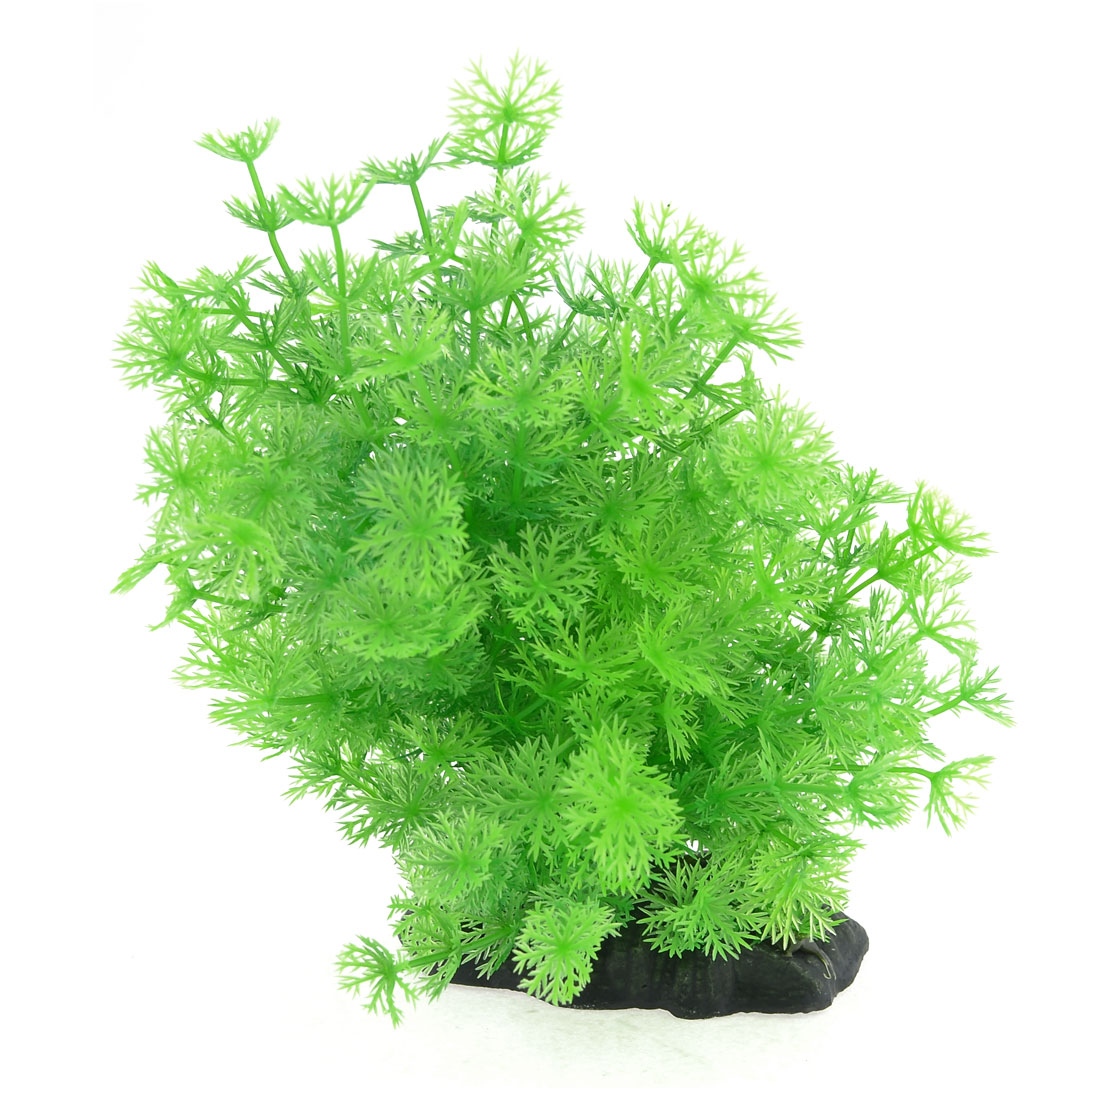 "Fish Tank Aquarium Ornament Decor Green Emulational Plastic Grass 6.3"" Height"